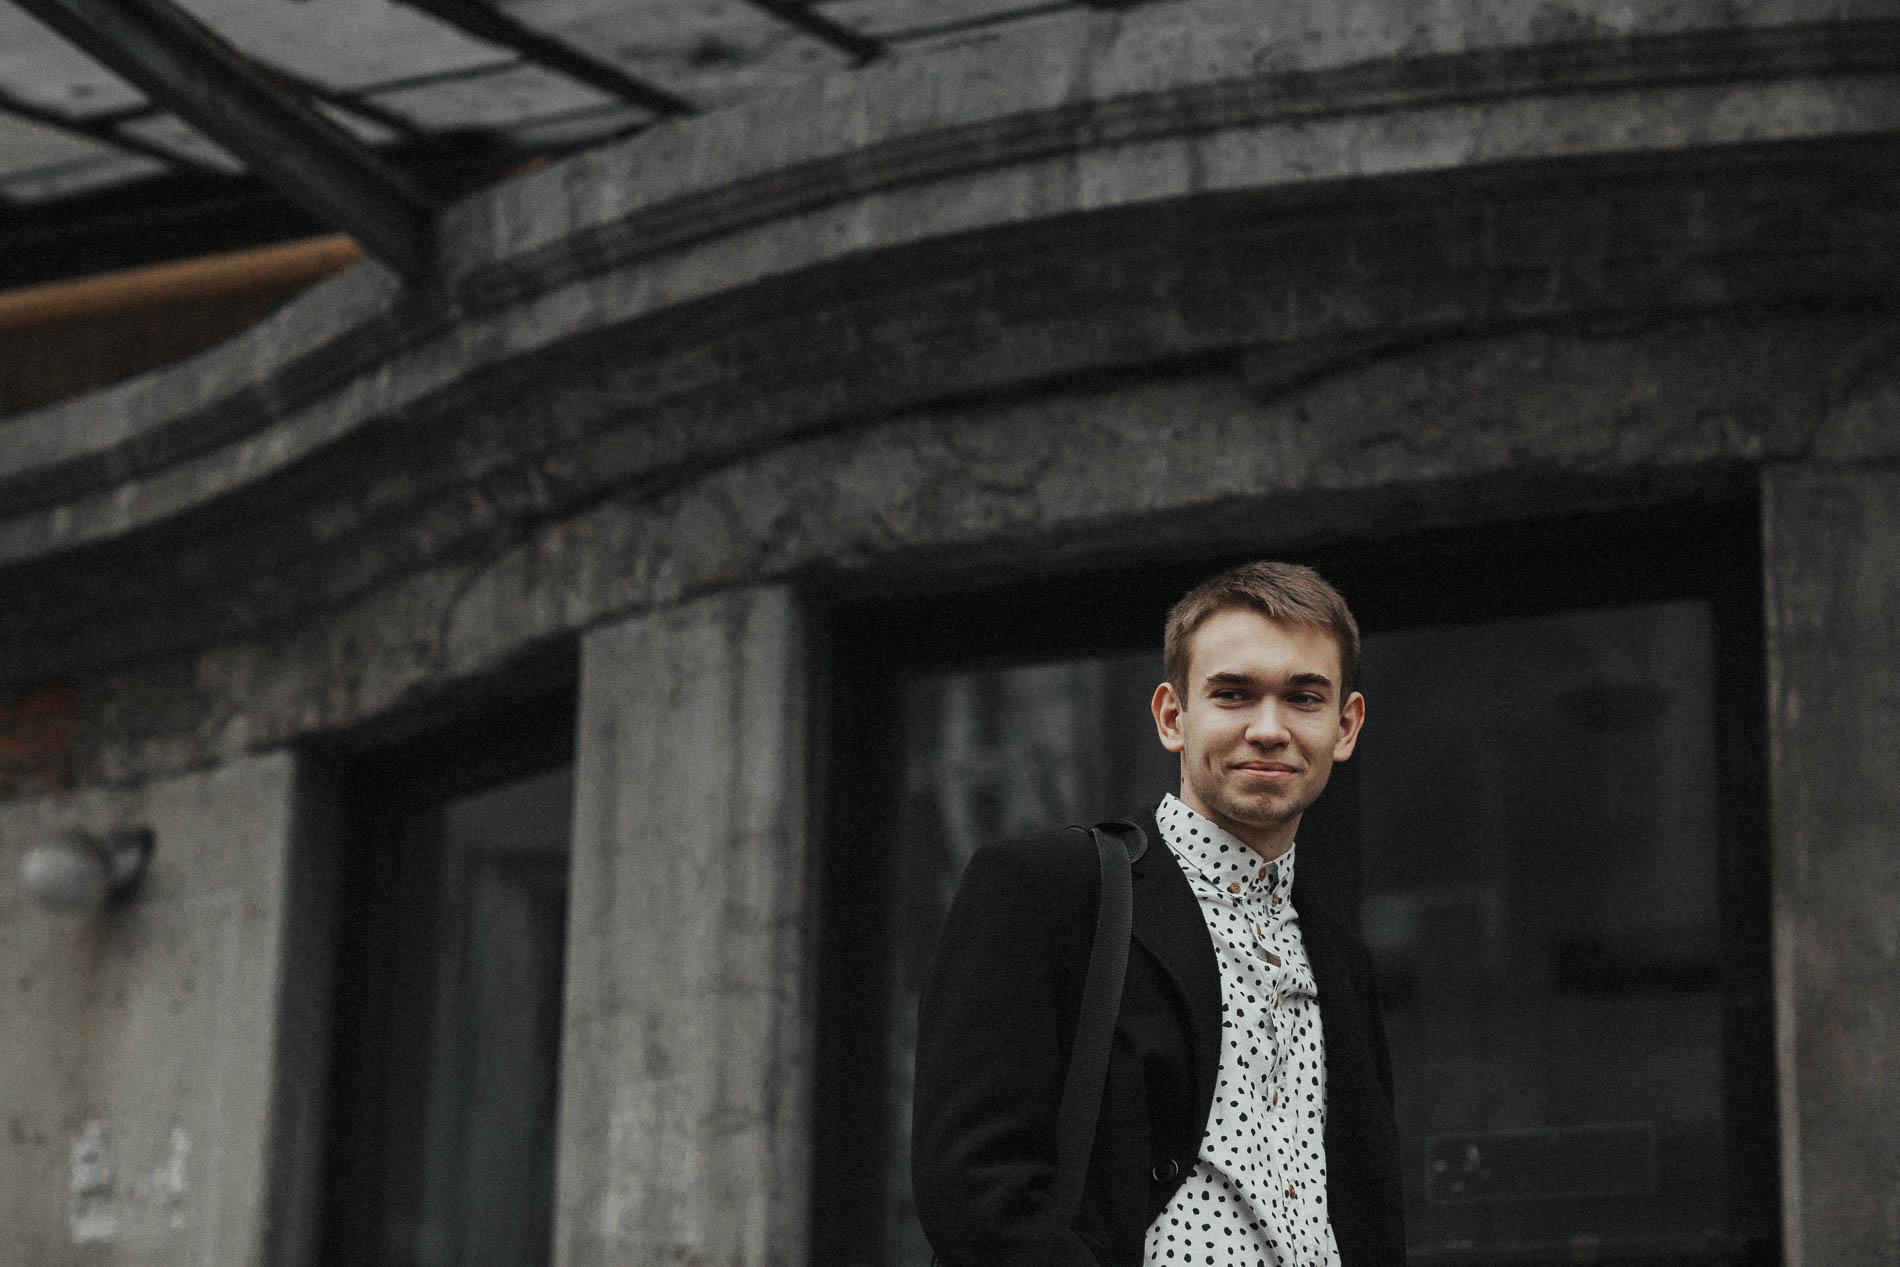 ferencz andras ios android developer fotografie portret targu mures fotograf majos daniel